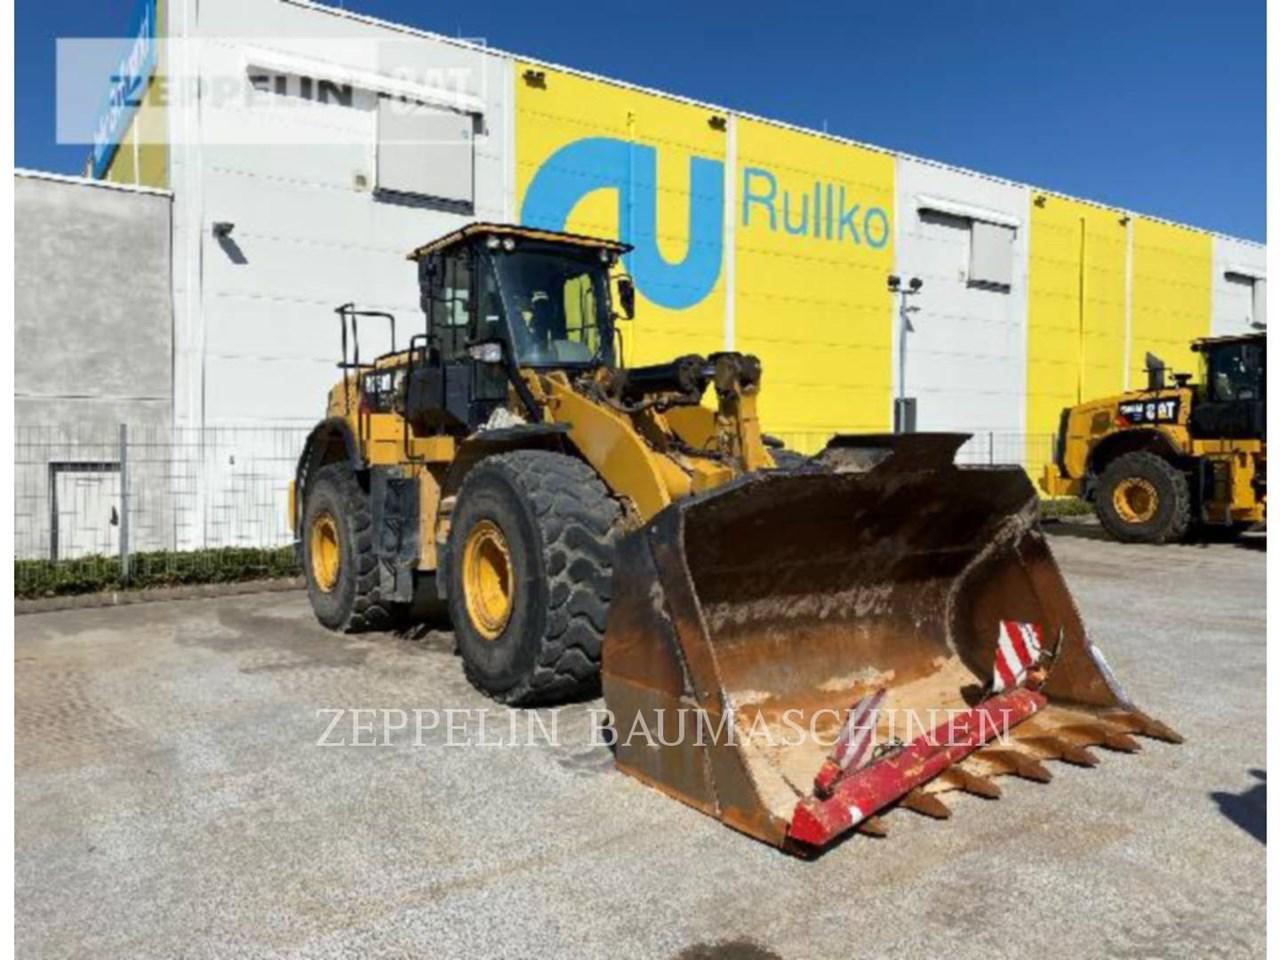 2015 Caterpillar 966MXE Image 4